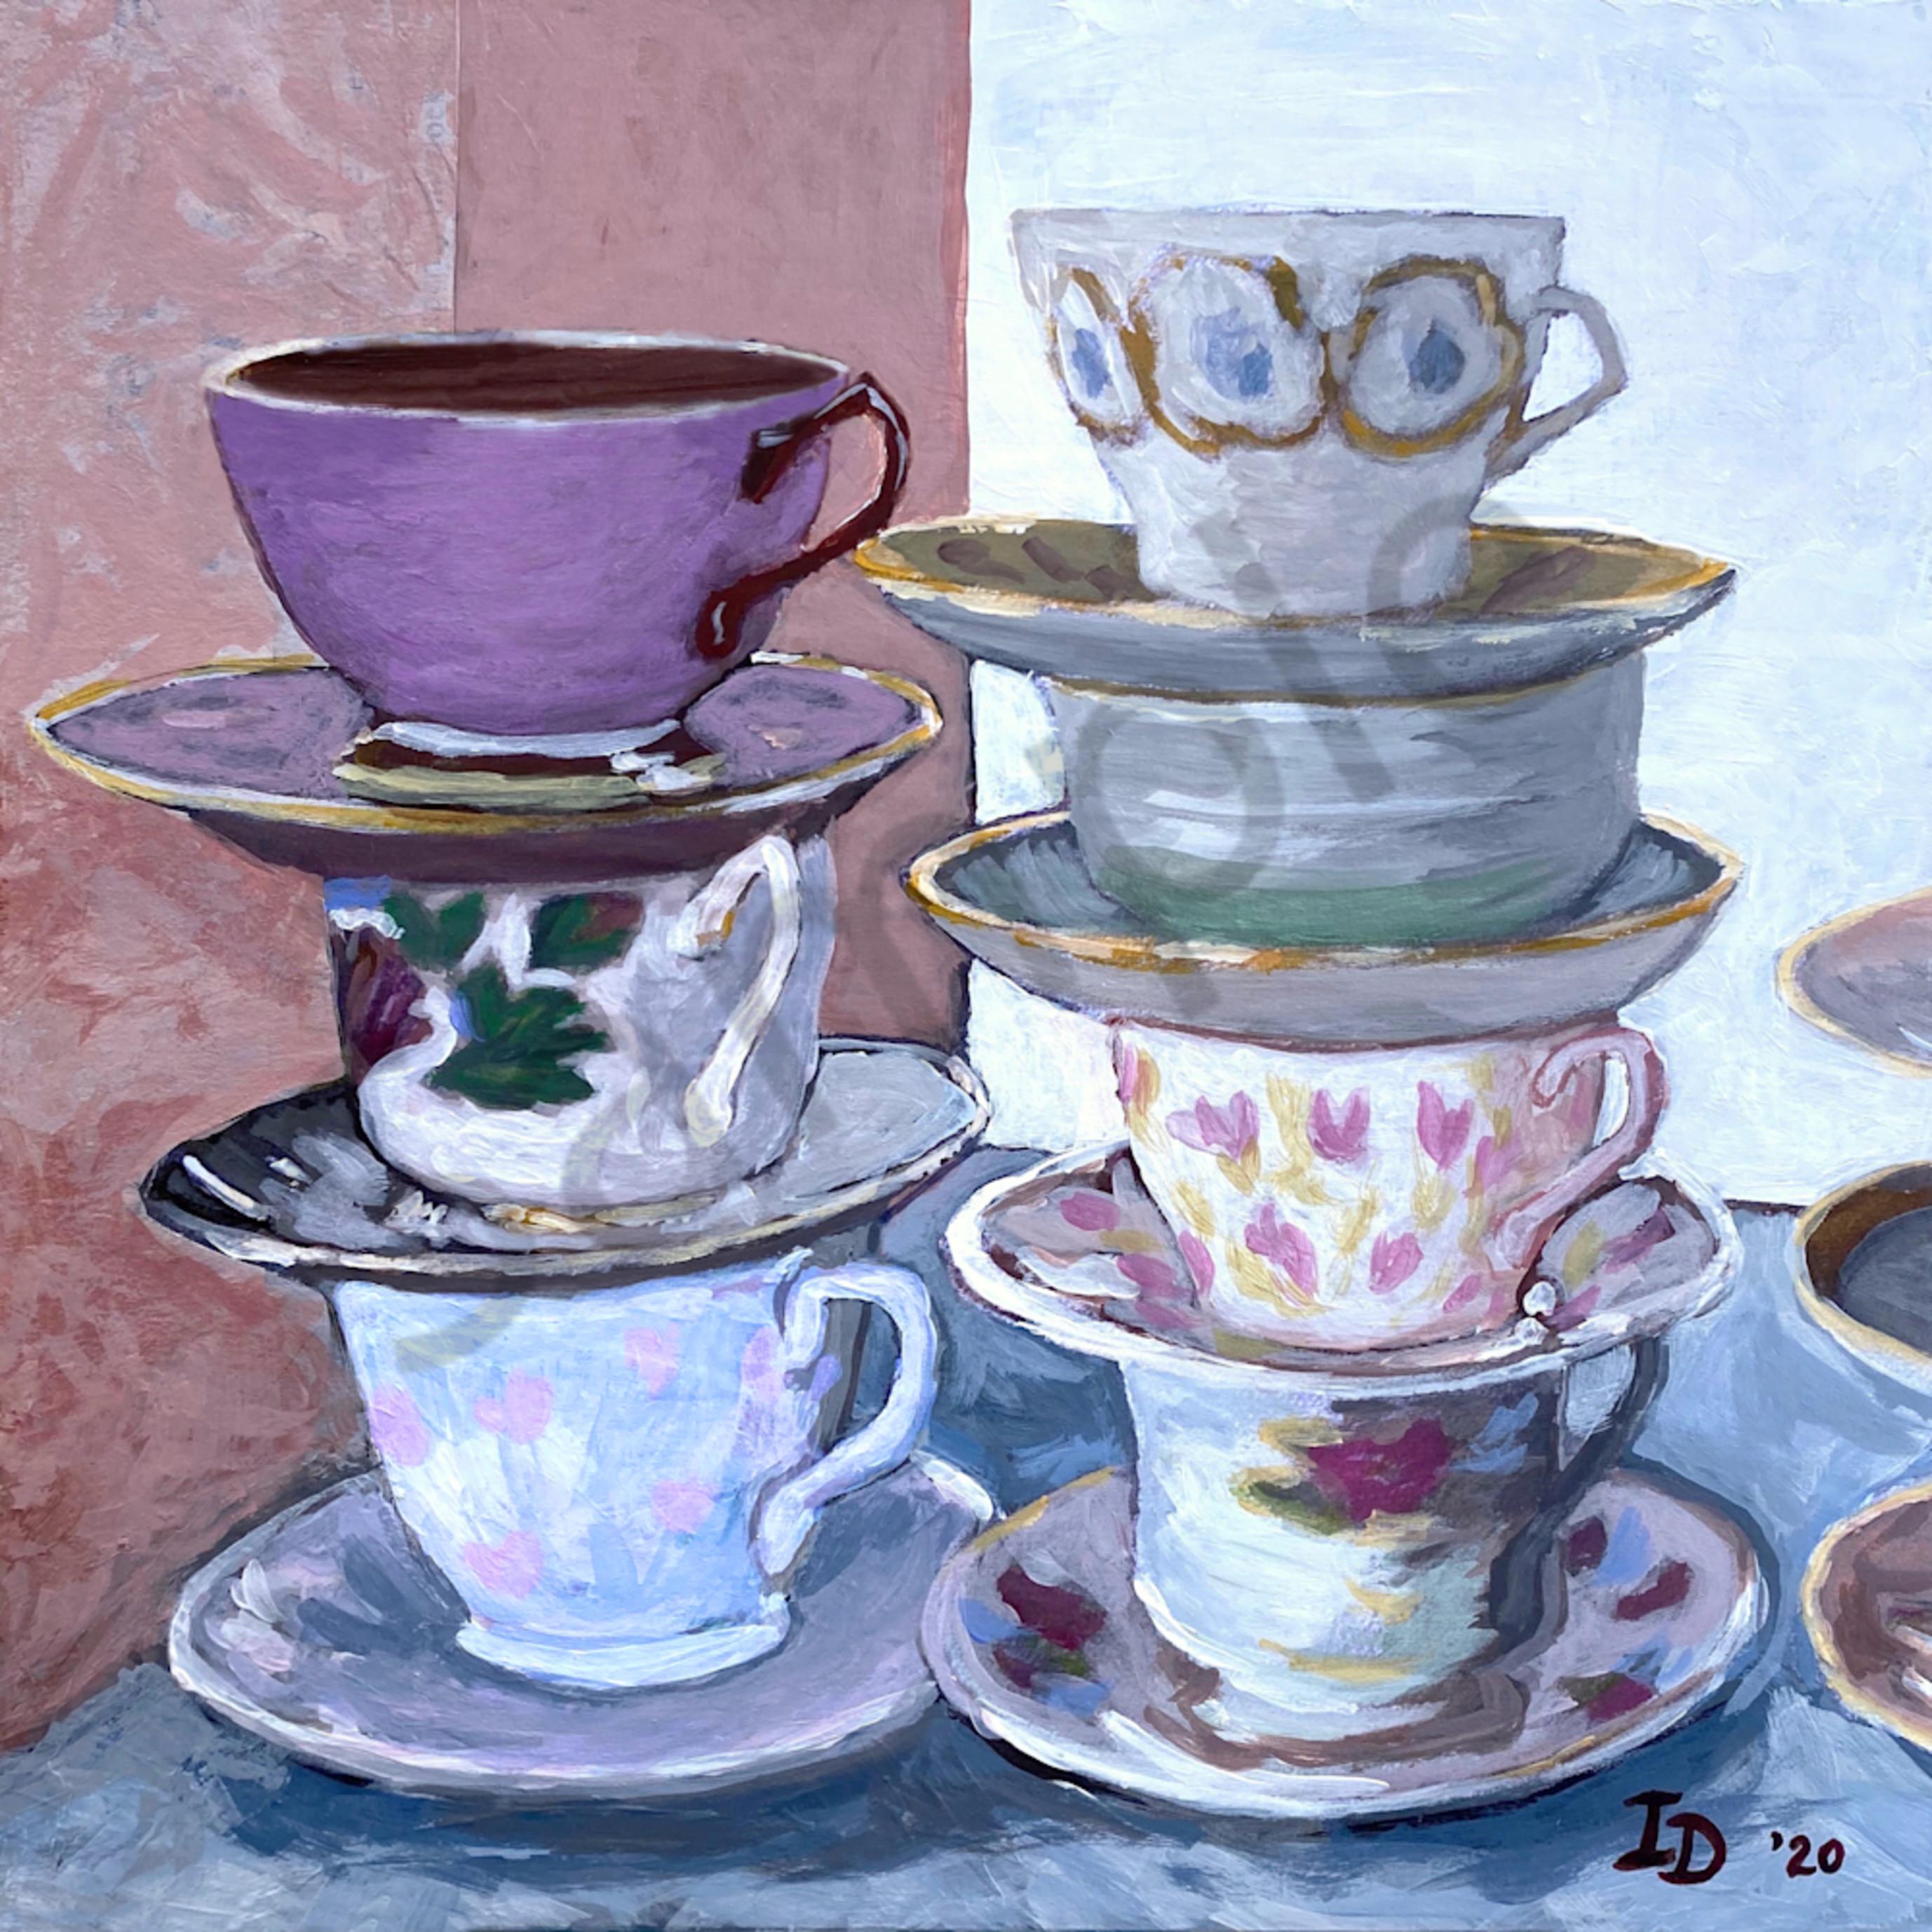 Inna dzhanibekova 06 still life with teacups  2 v3 wm6ay8